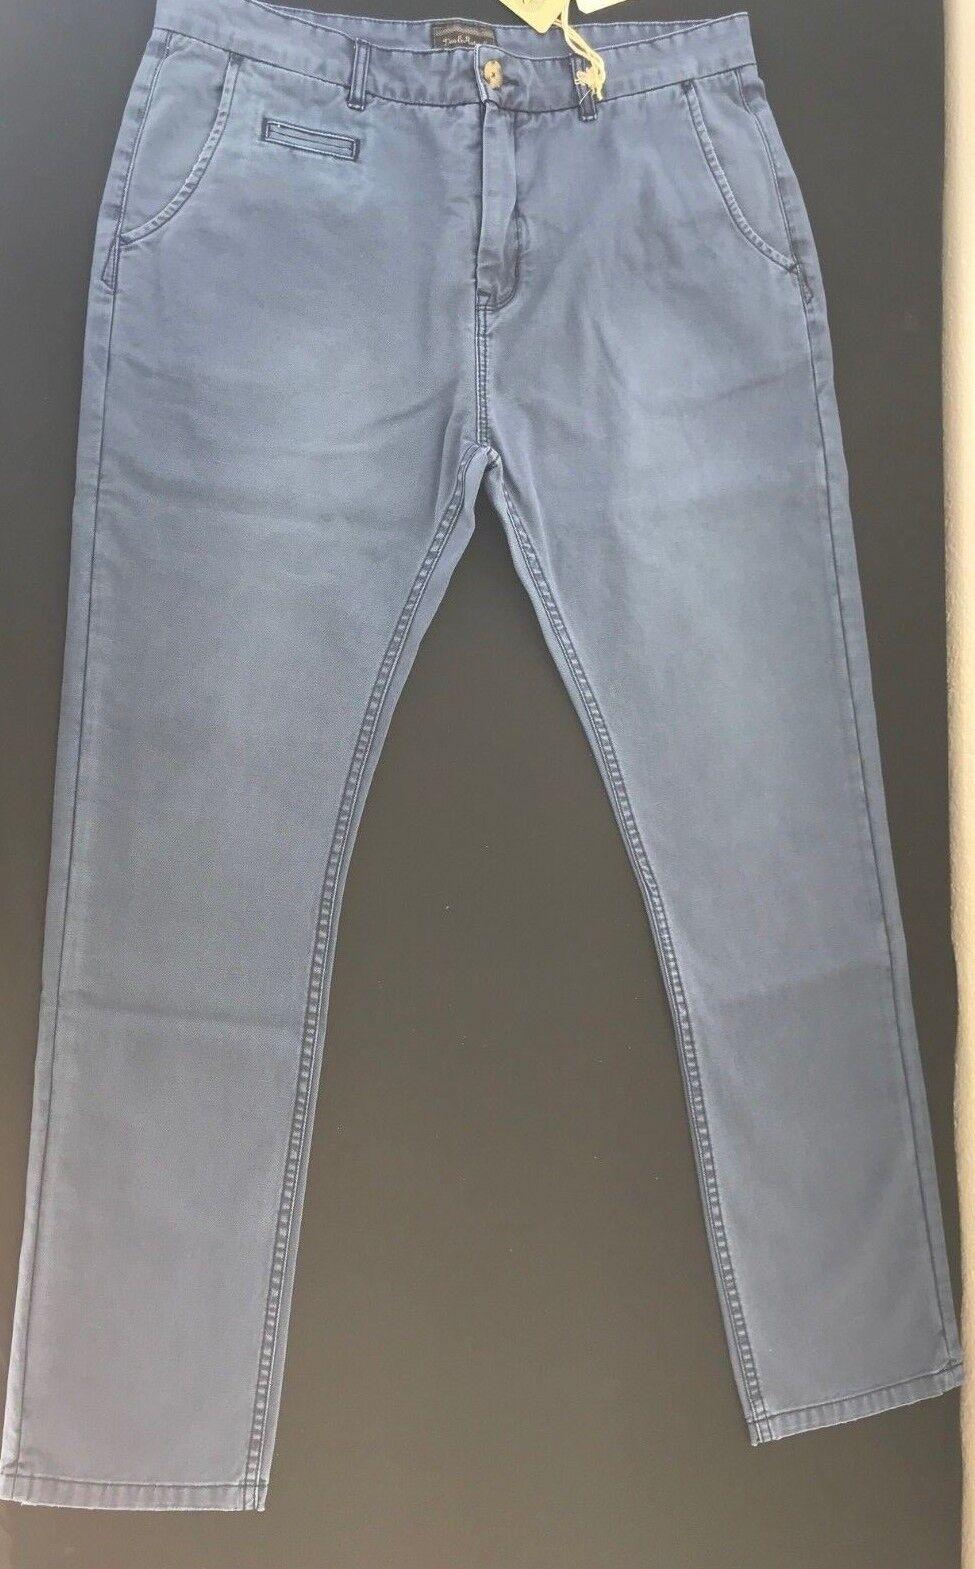 Deus Otis Pants   Vintage Garment Dye  Indigo   Men's Pants Size 34